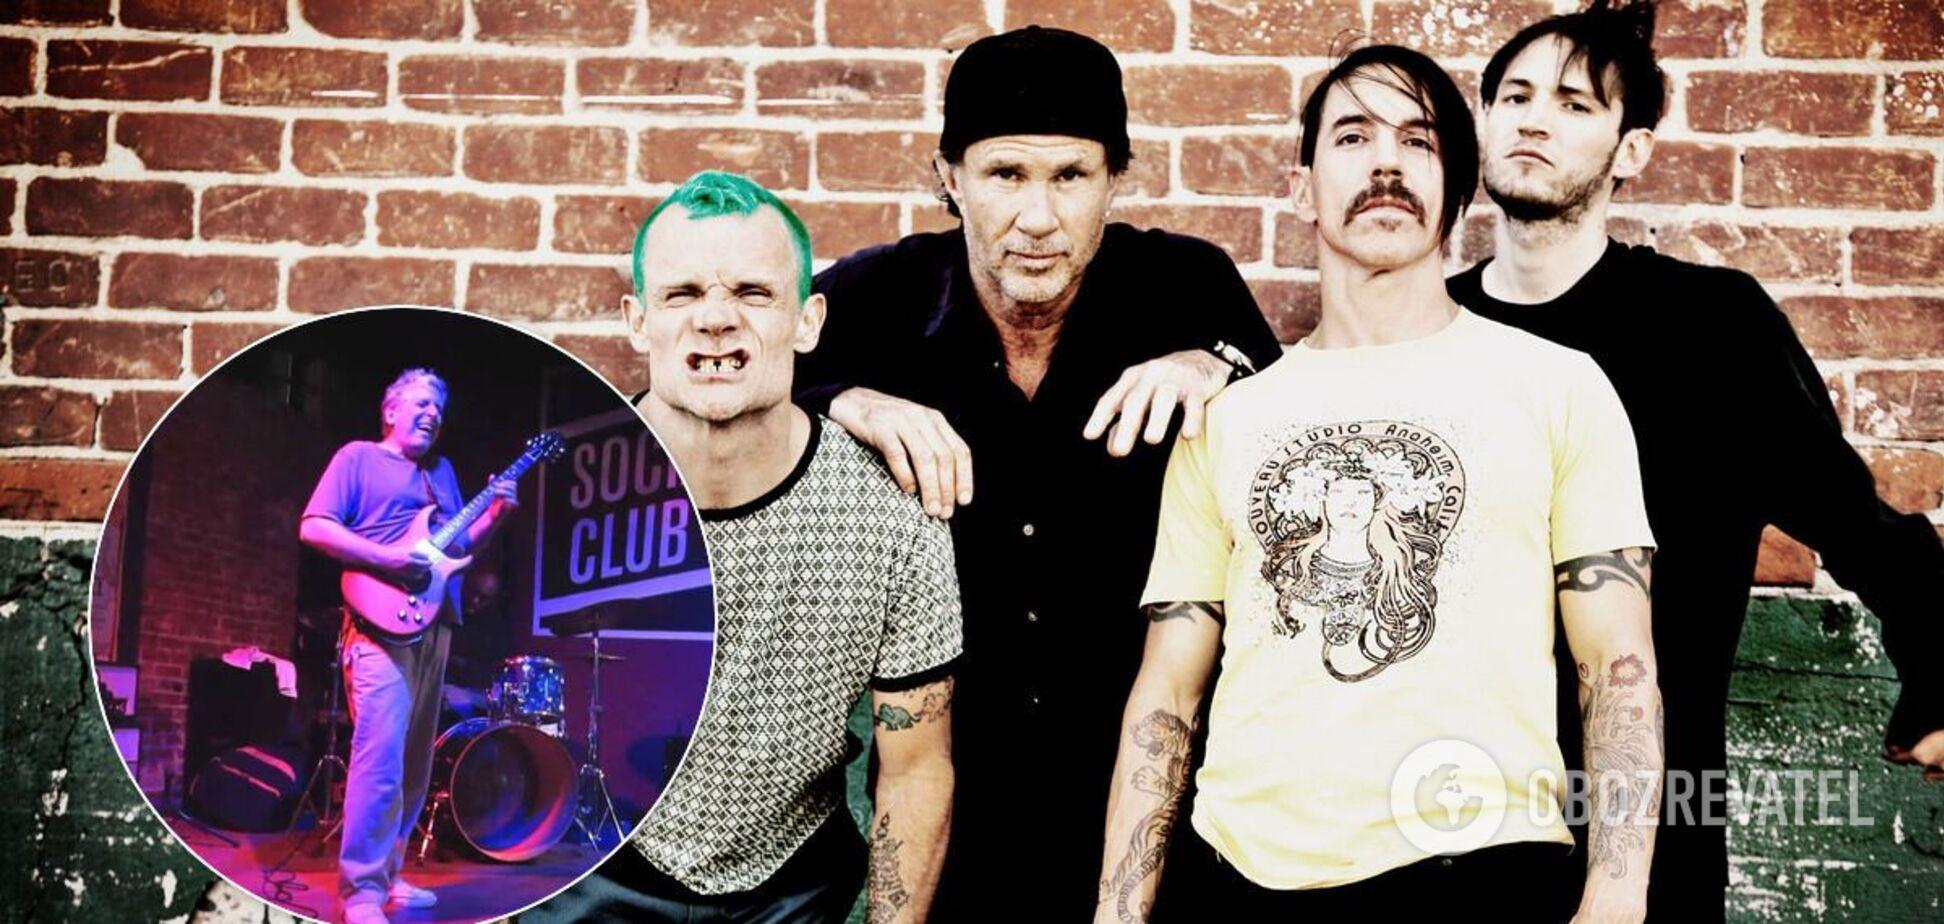 Помер колишній гітаристRed Hot Chili Peppers Джек Шерман